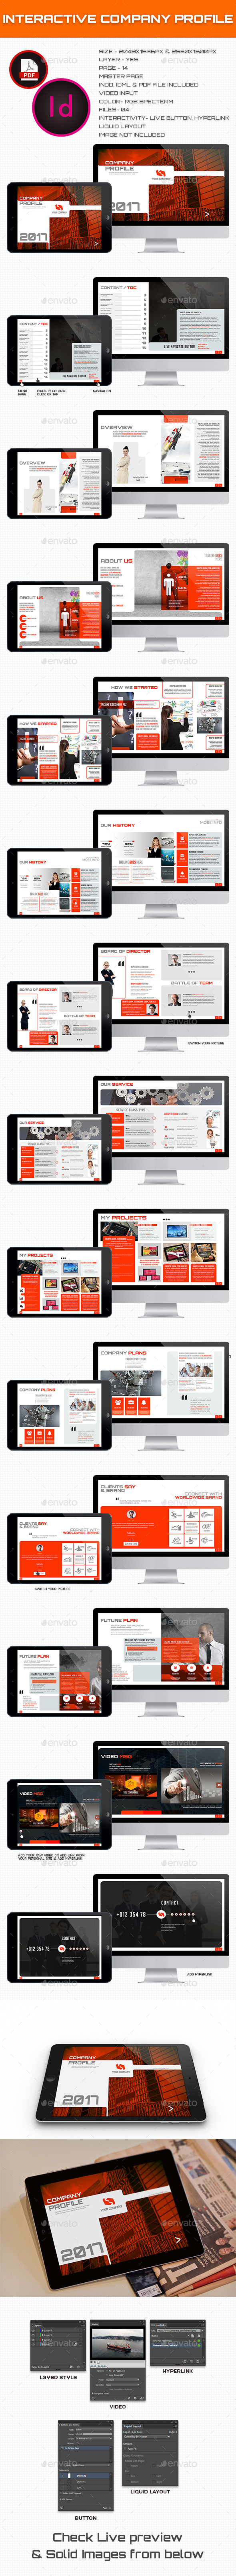 Interactive Company Profile - ePublishing